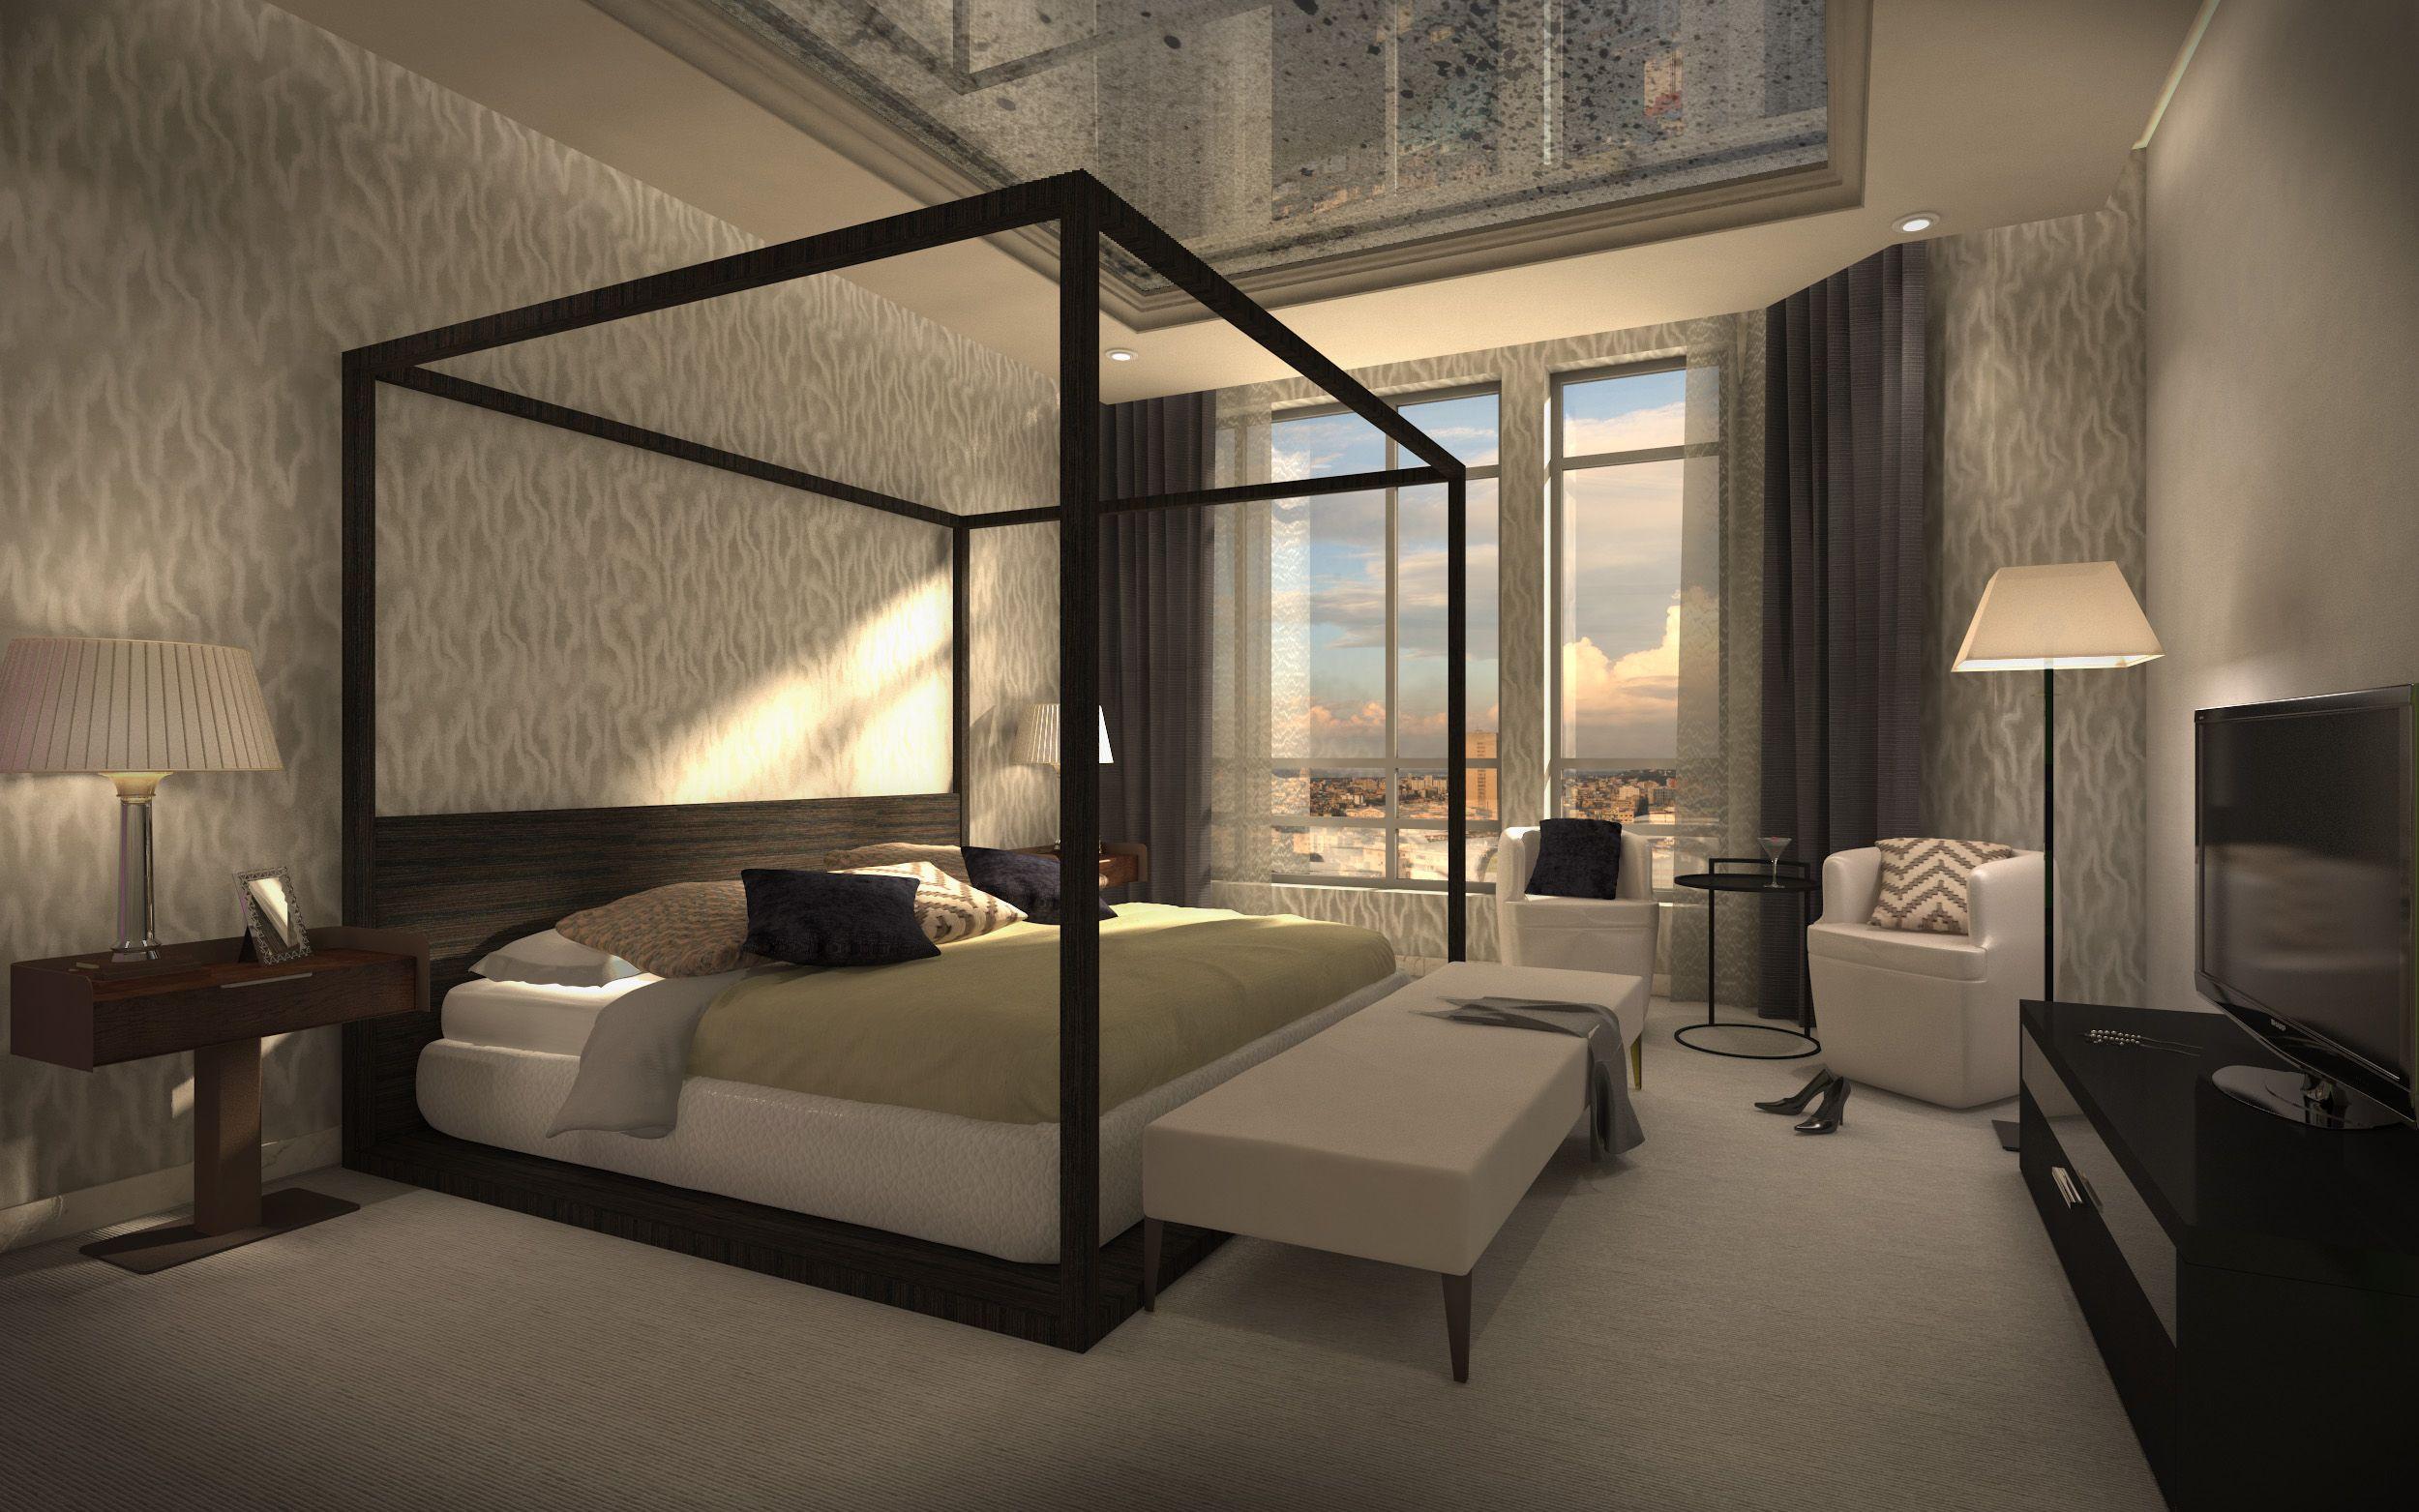 Bedroom Visual Luxury Apartments China House Dream